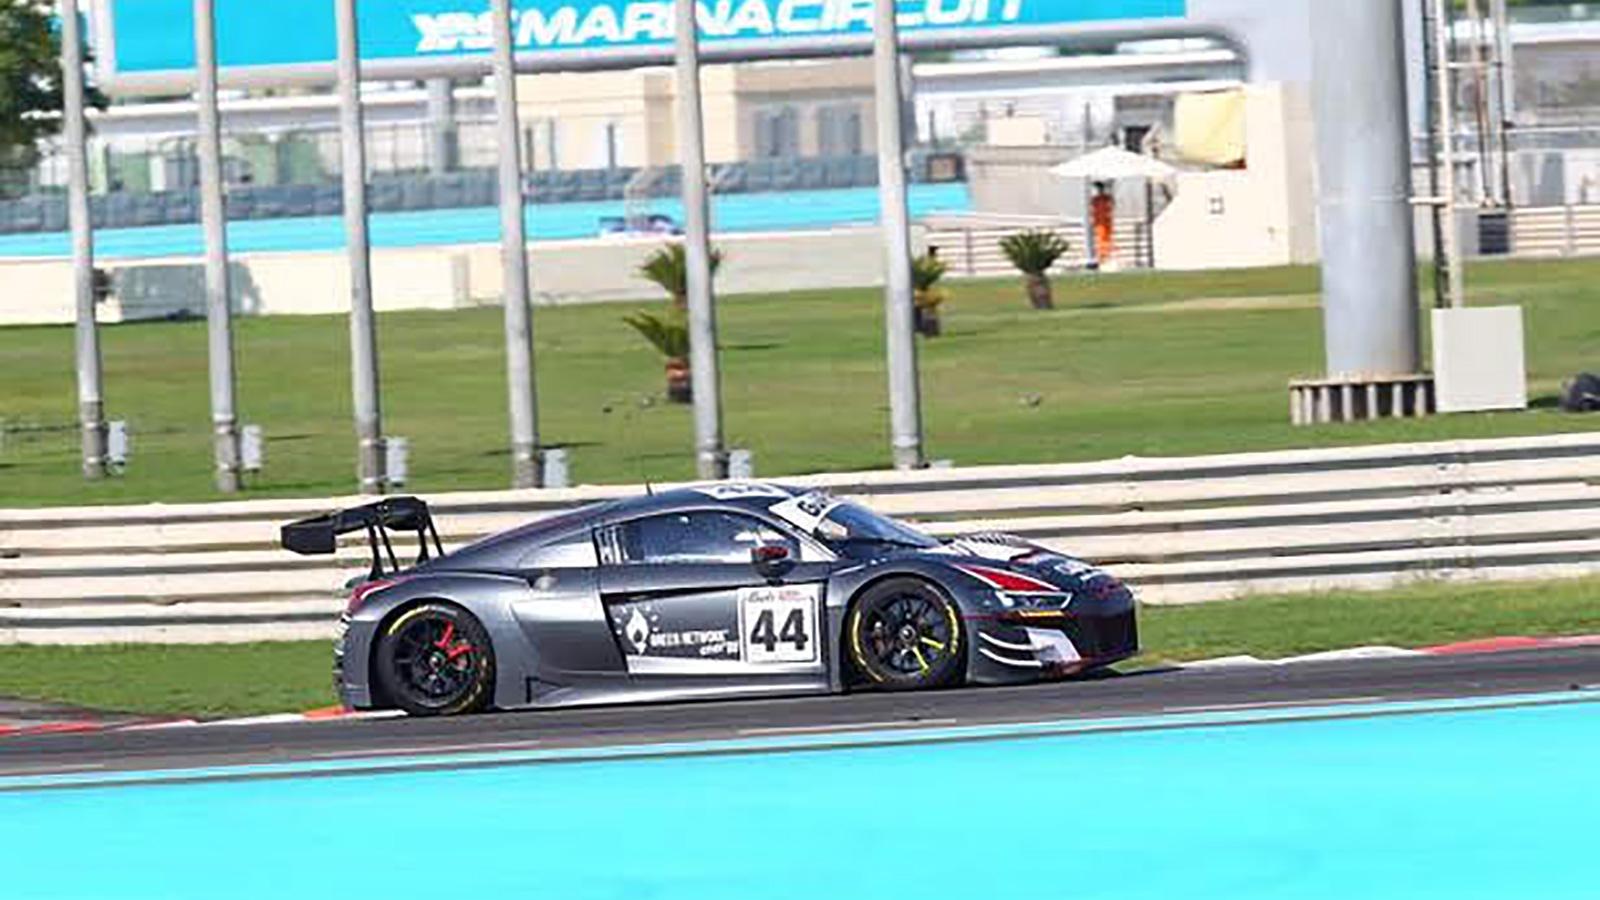 Britain's Sean Walkinshaw takes fantastic P3 finish in Gulf 12hrs.